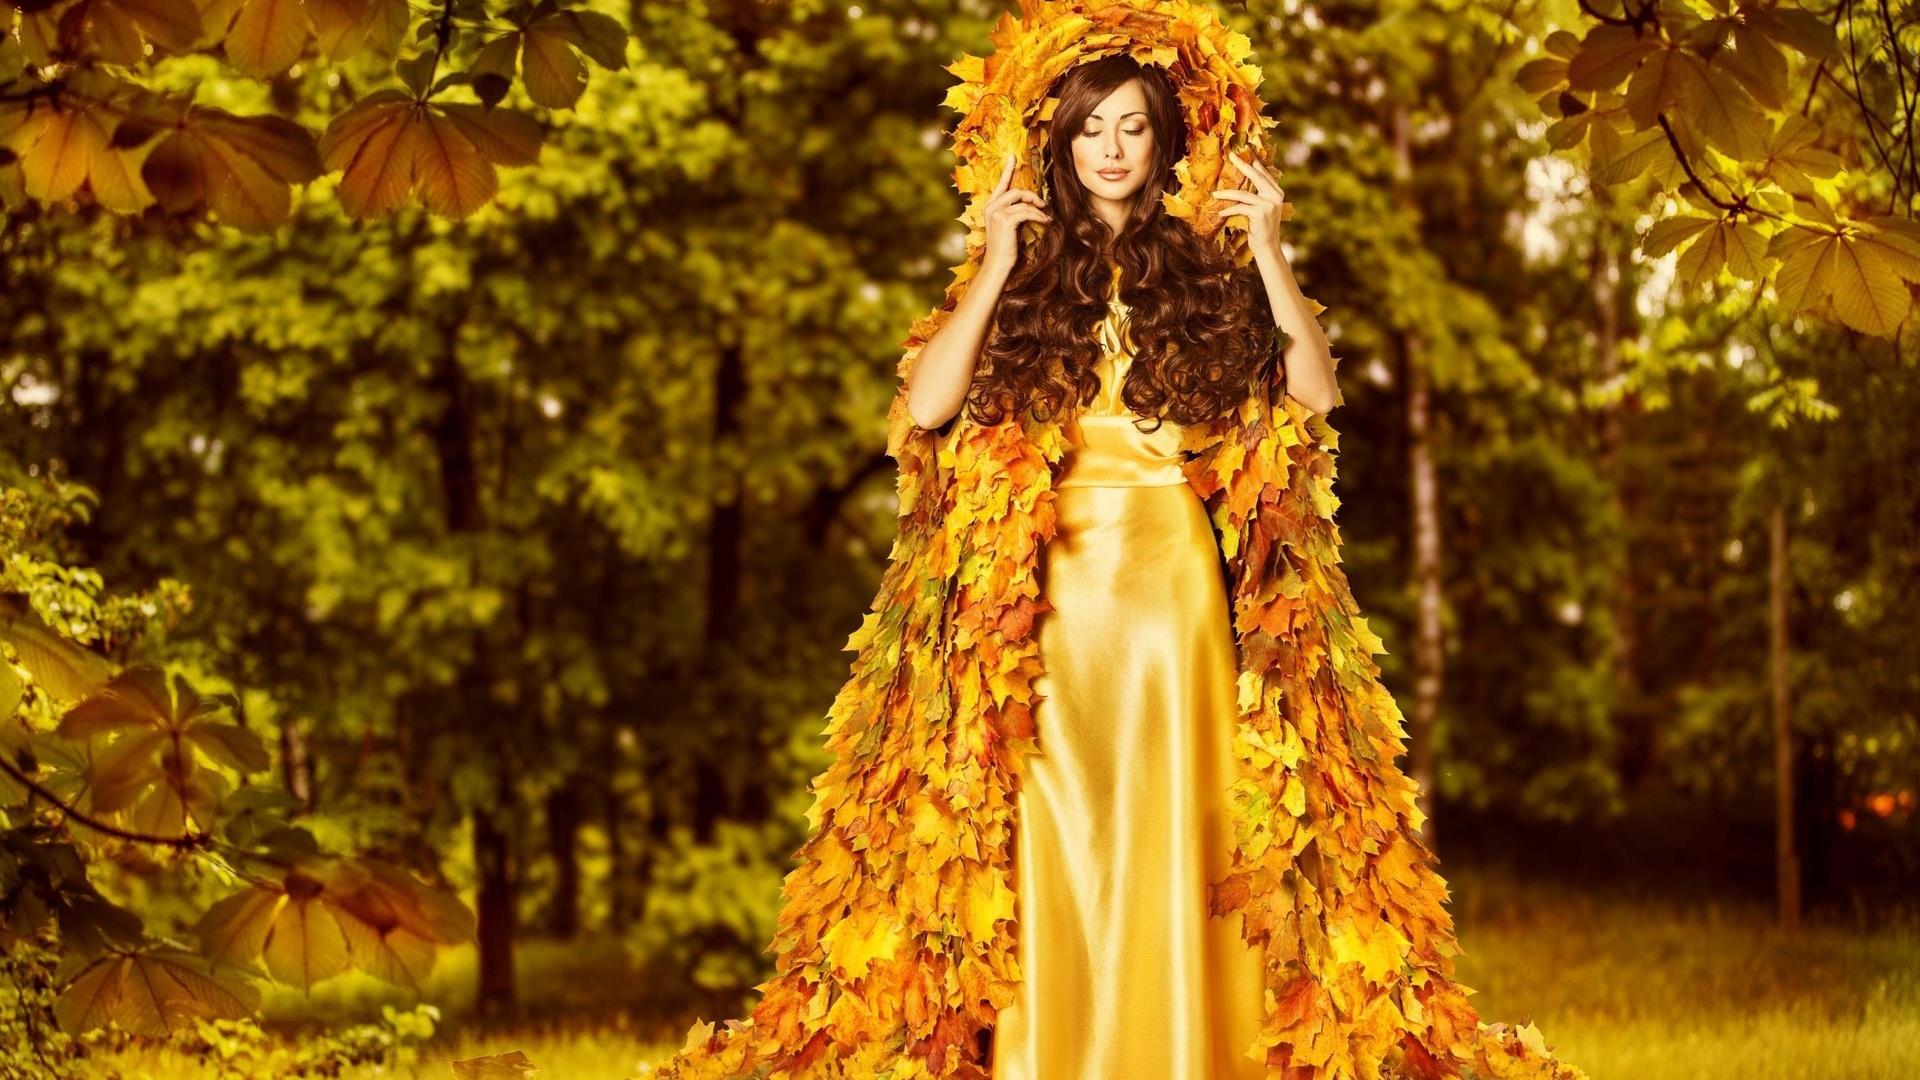 королева осень картинки фото